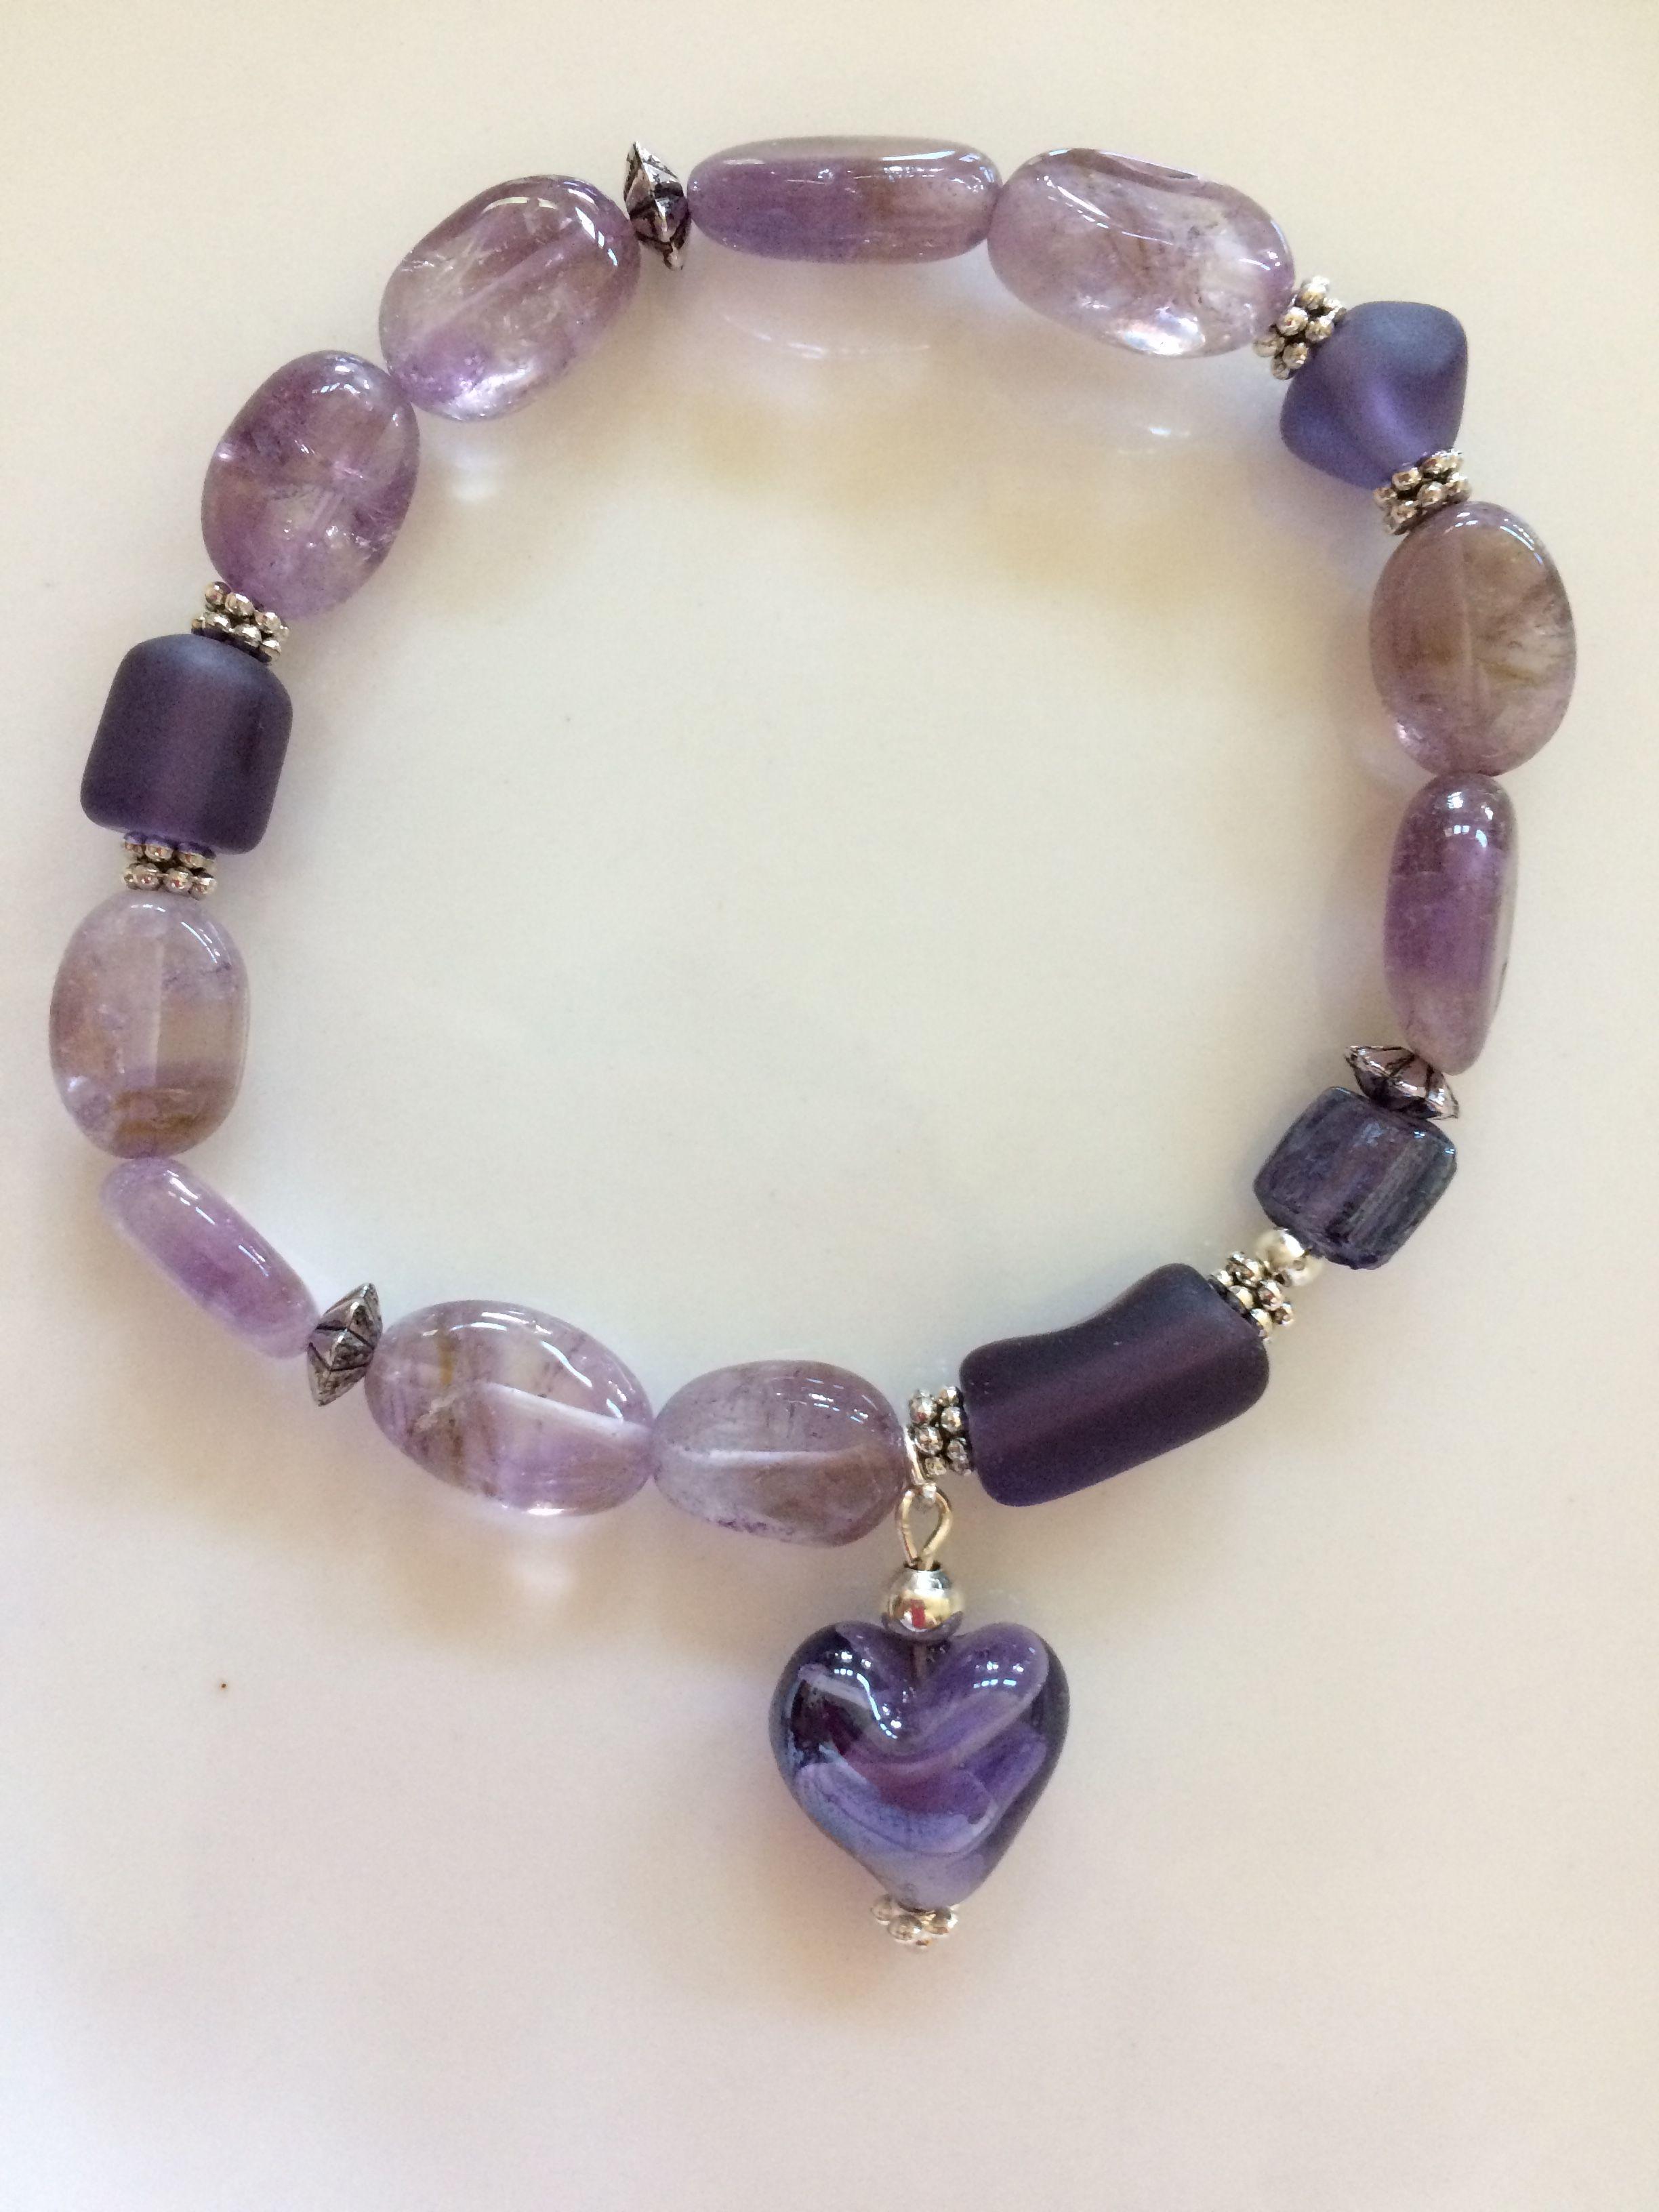 Beautiful Amethyst glass beads bracelet with heart pendant!